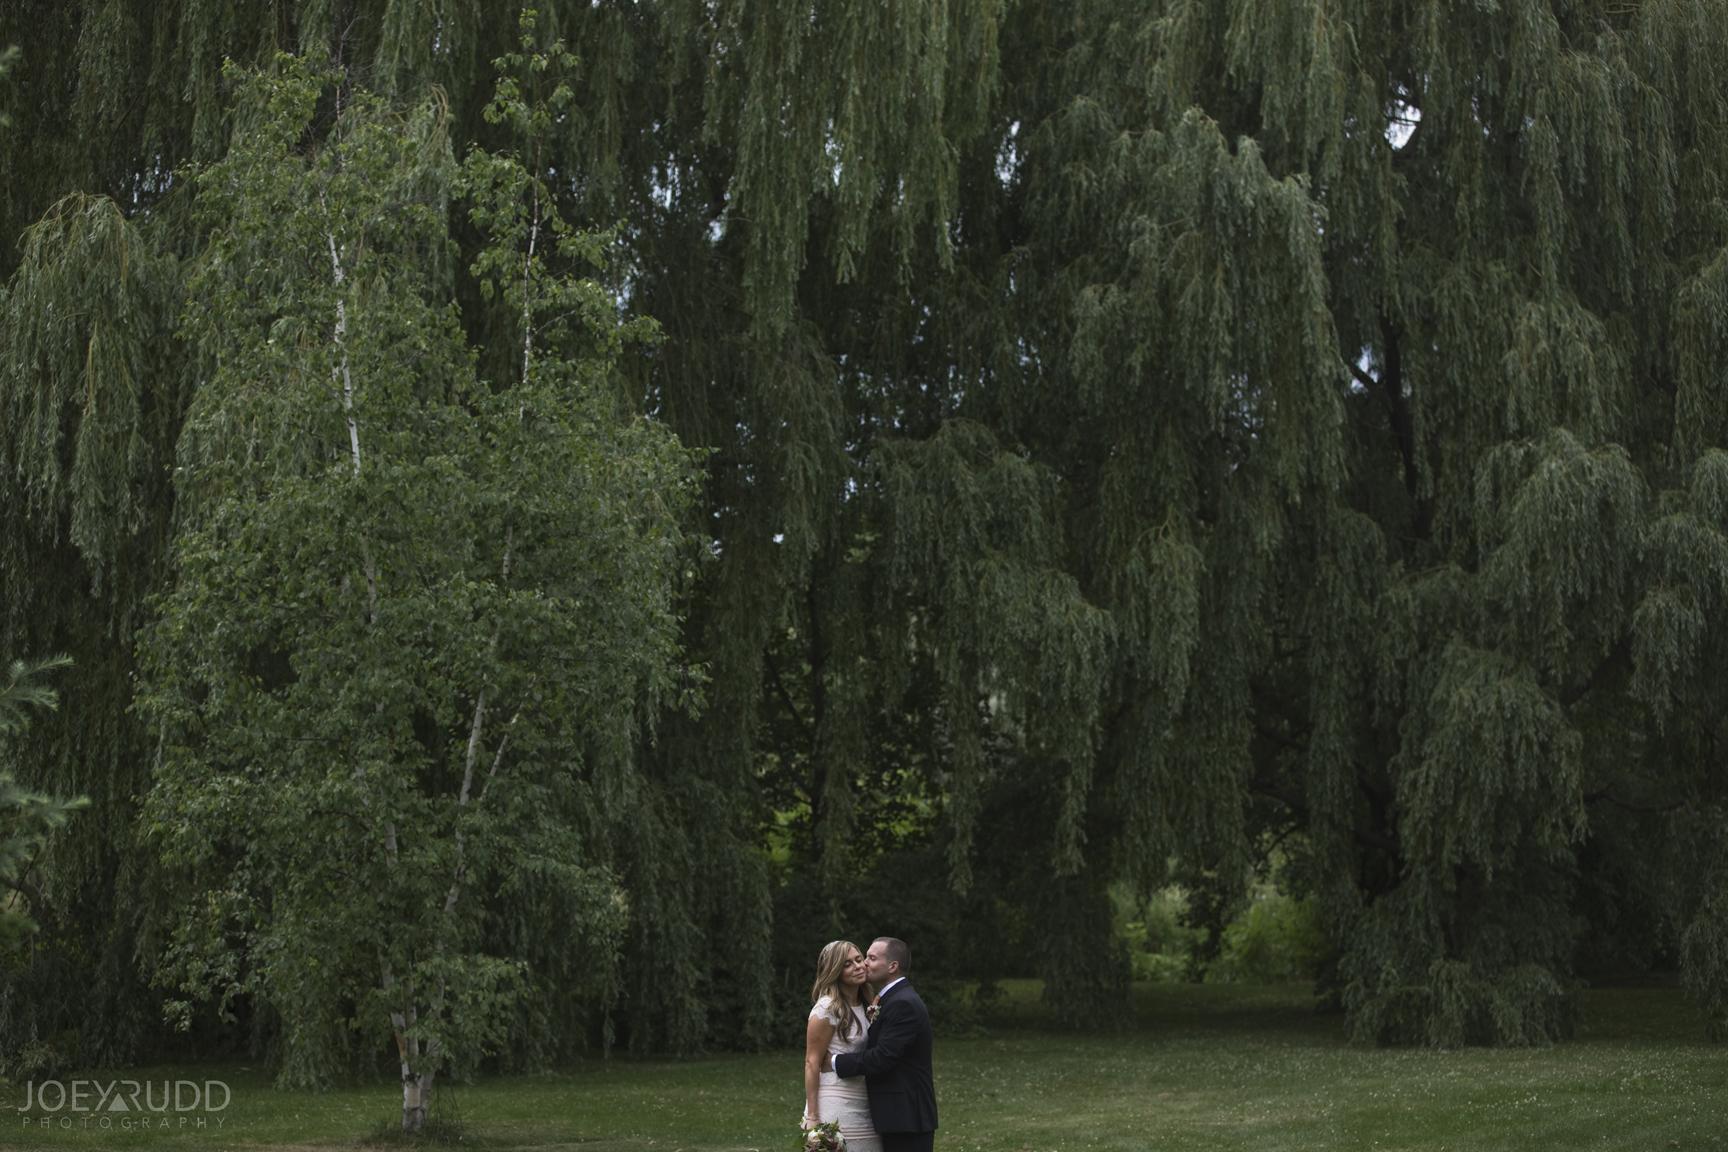 Elopement Wedding by Ottawa Wedding Photographer Joey Rudd Photography Arboretum Willows